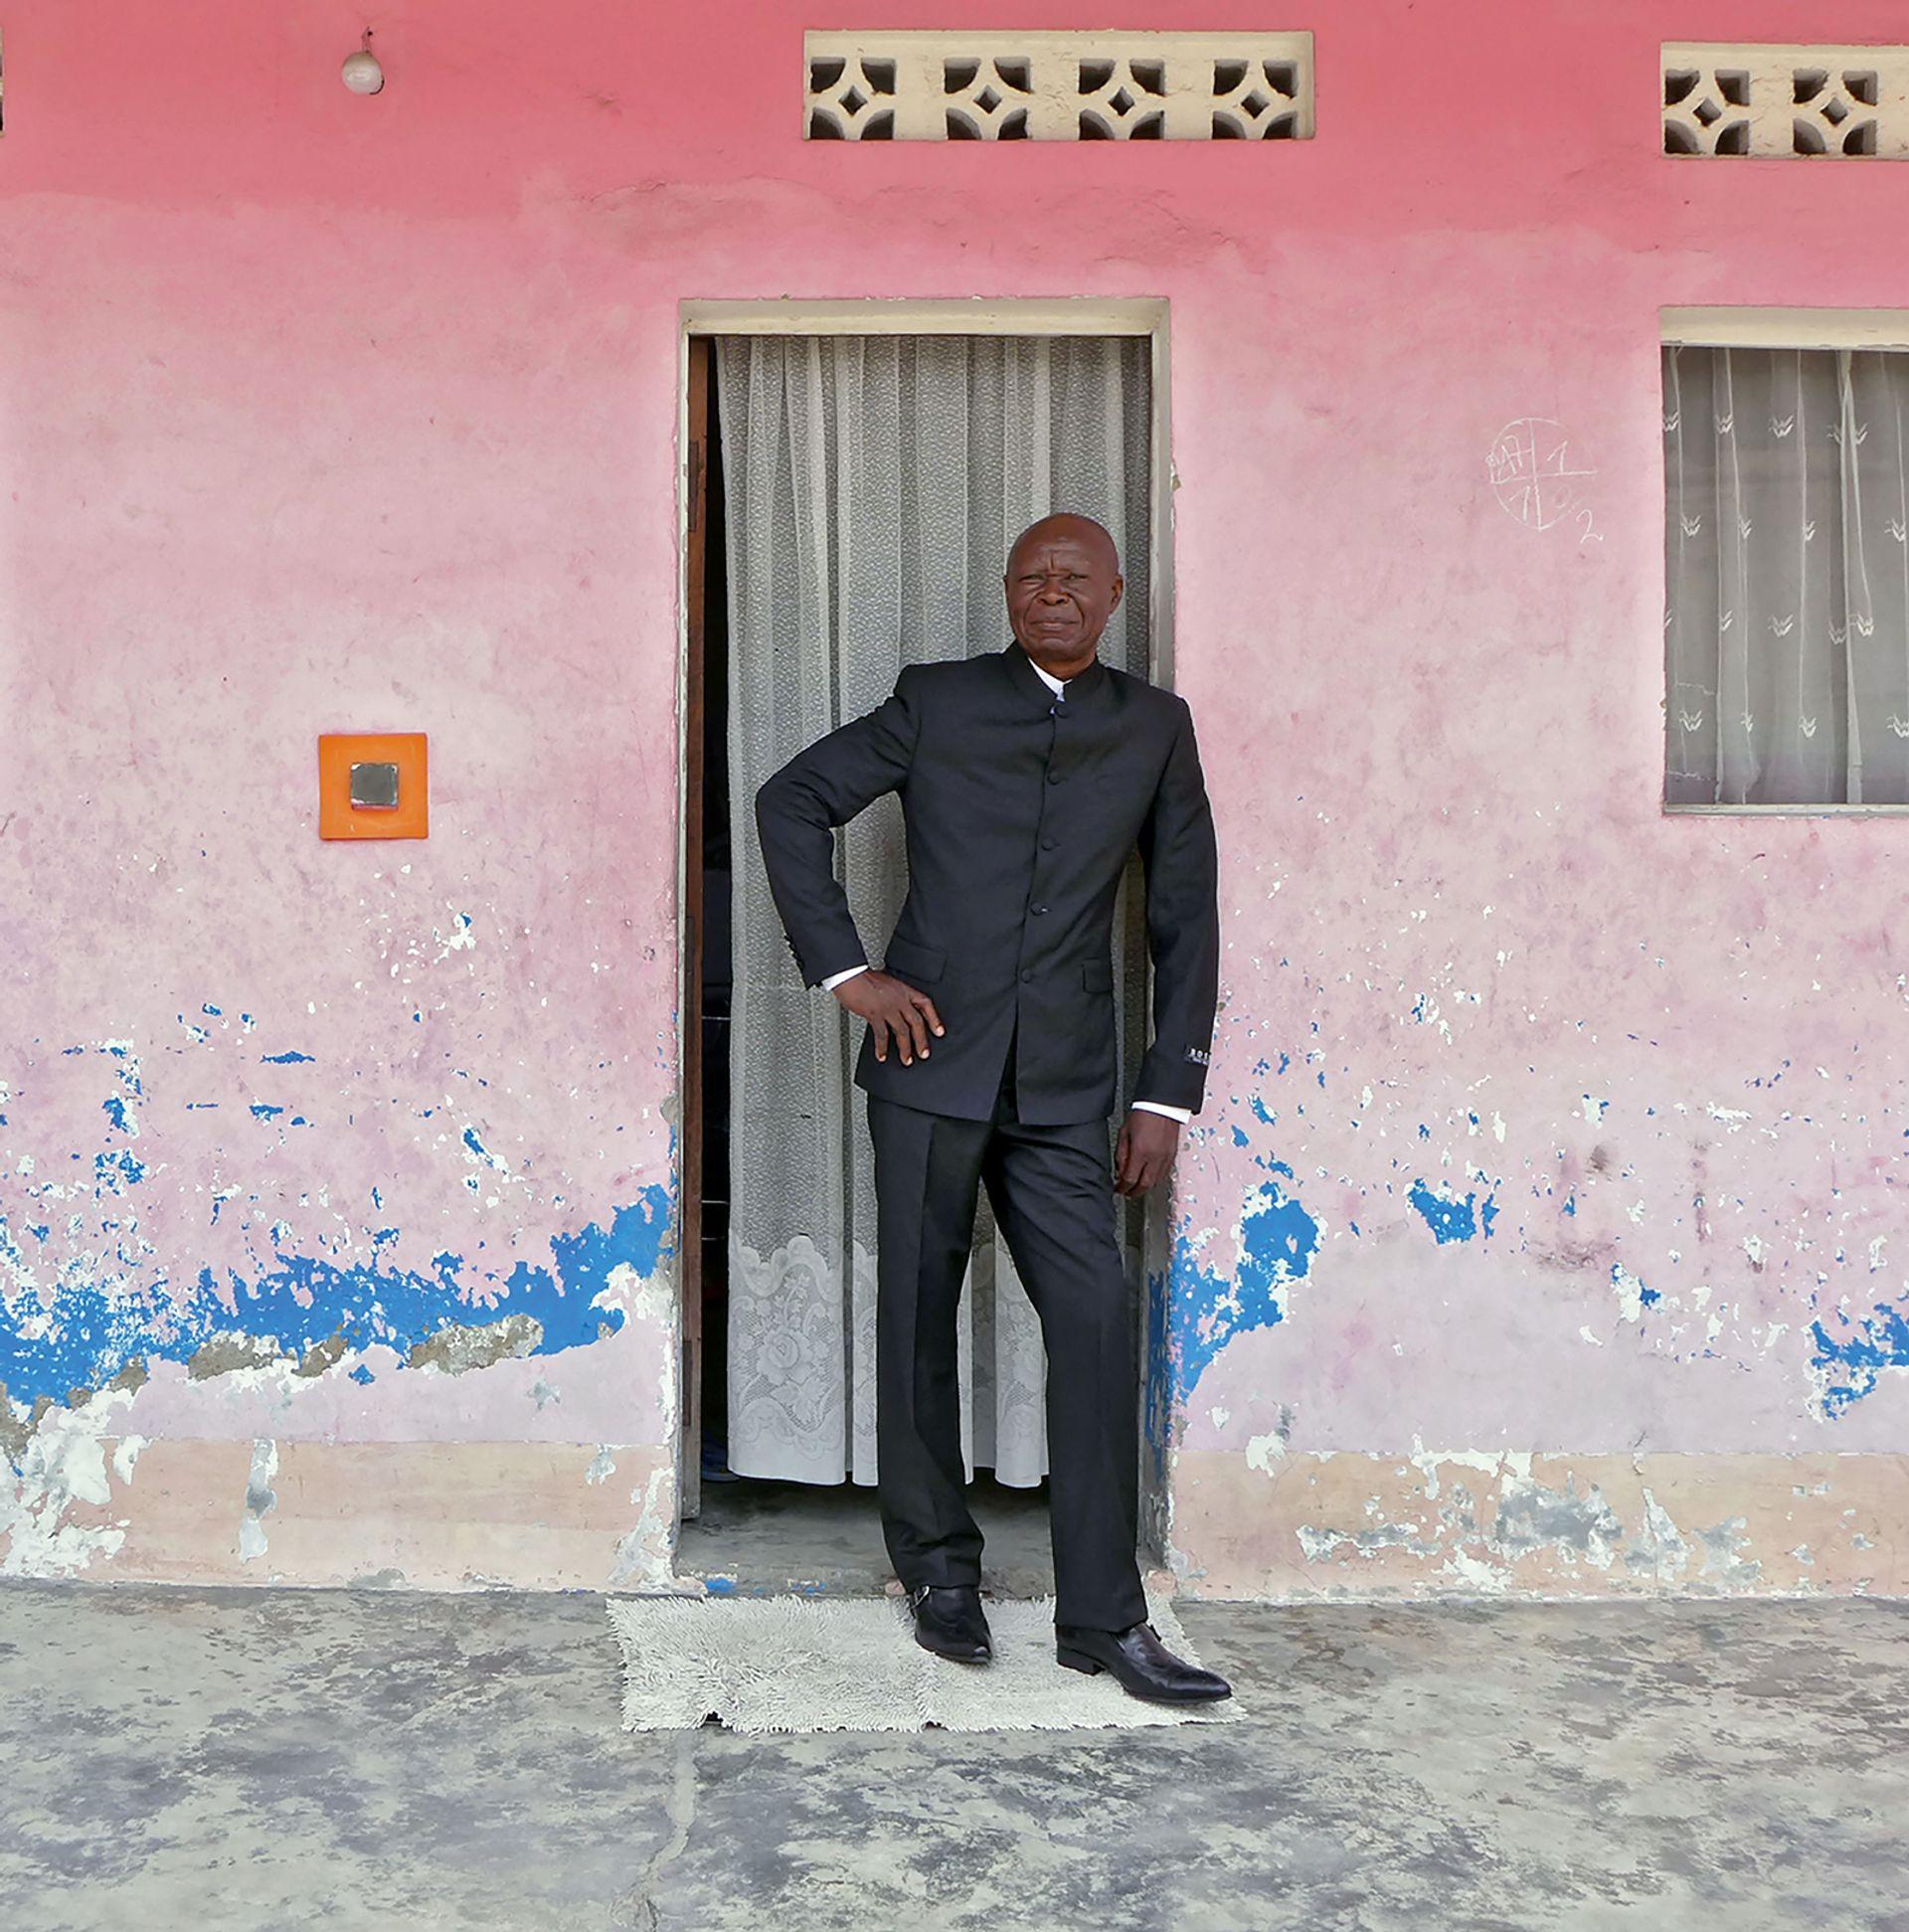 Bodys Isek Kingelez outside his Kinshasa home in 2014 Courtesy of André Magnin, Paris; Photo: Fredi Casco.